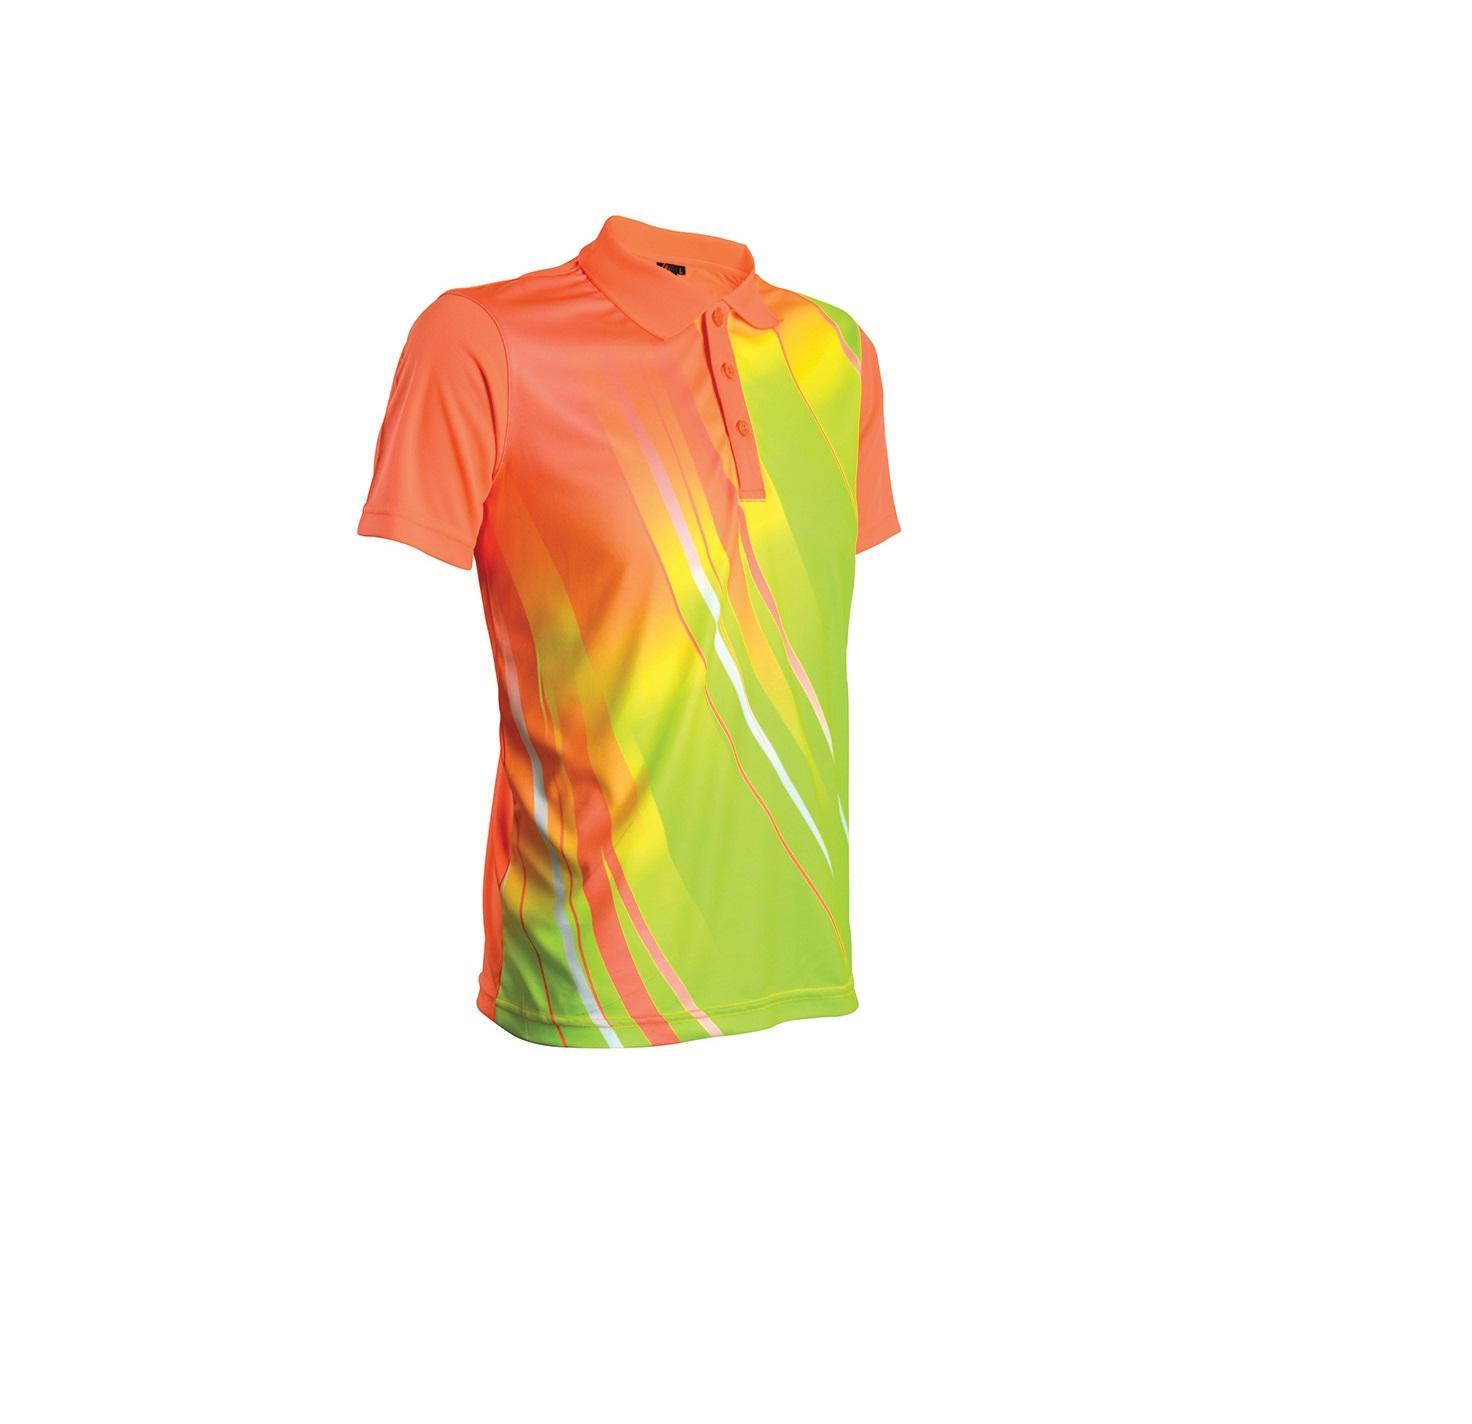 Design t shirt neon colors - Qd 4204 Safety Orange Volt Green Yellow